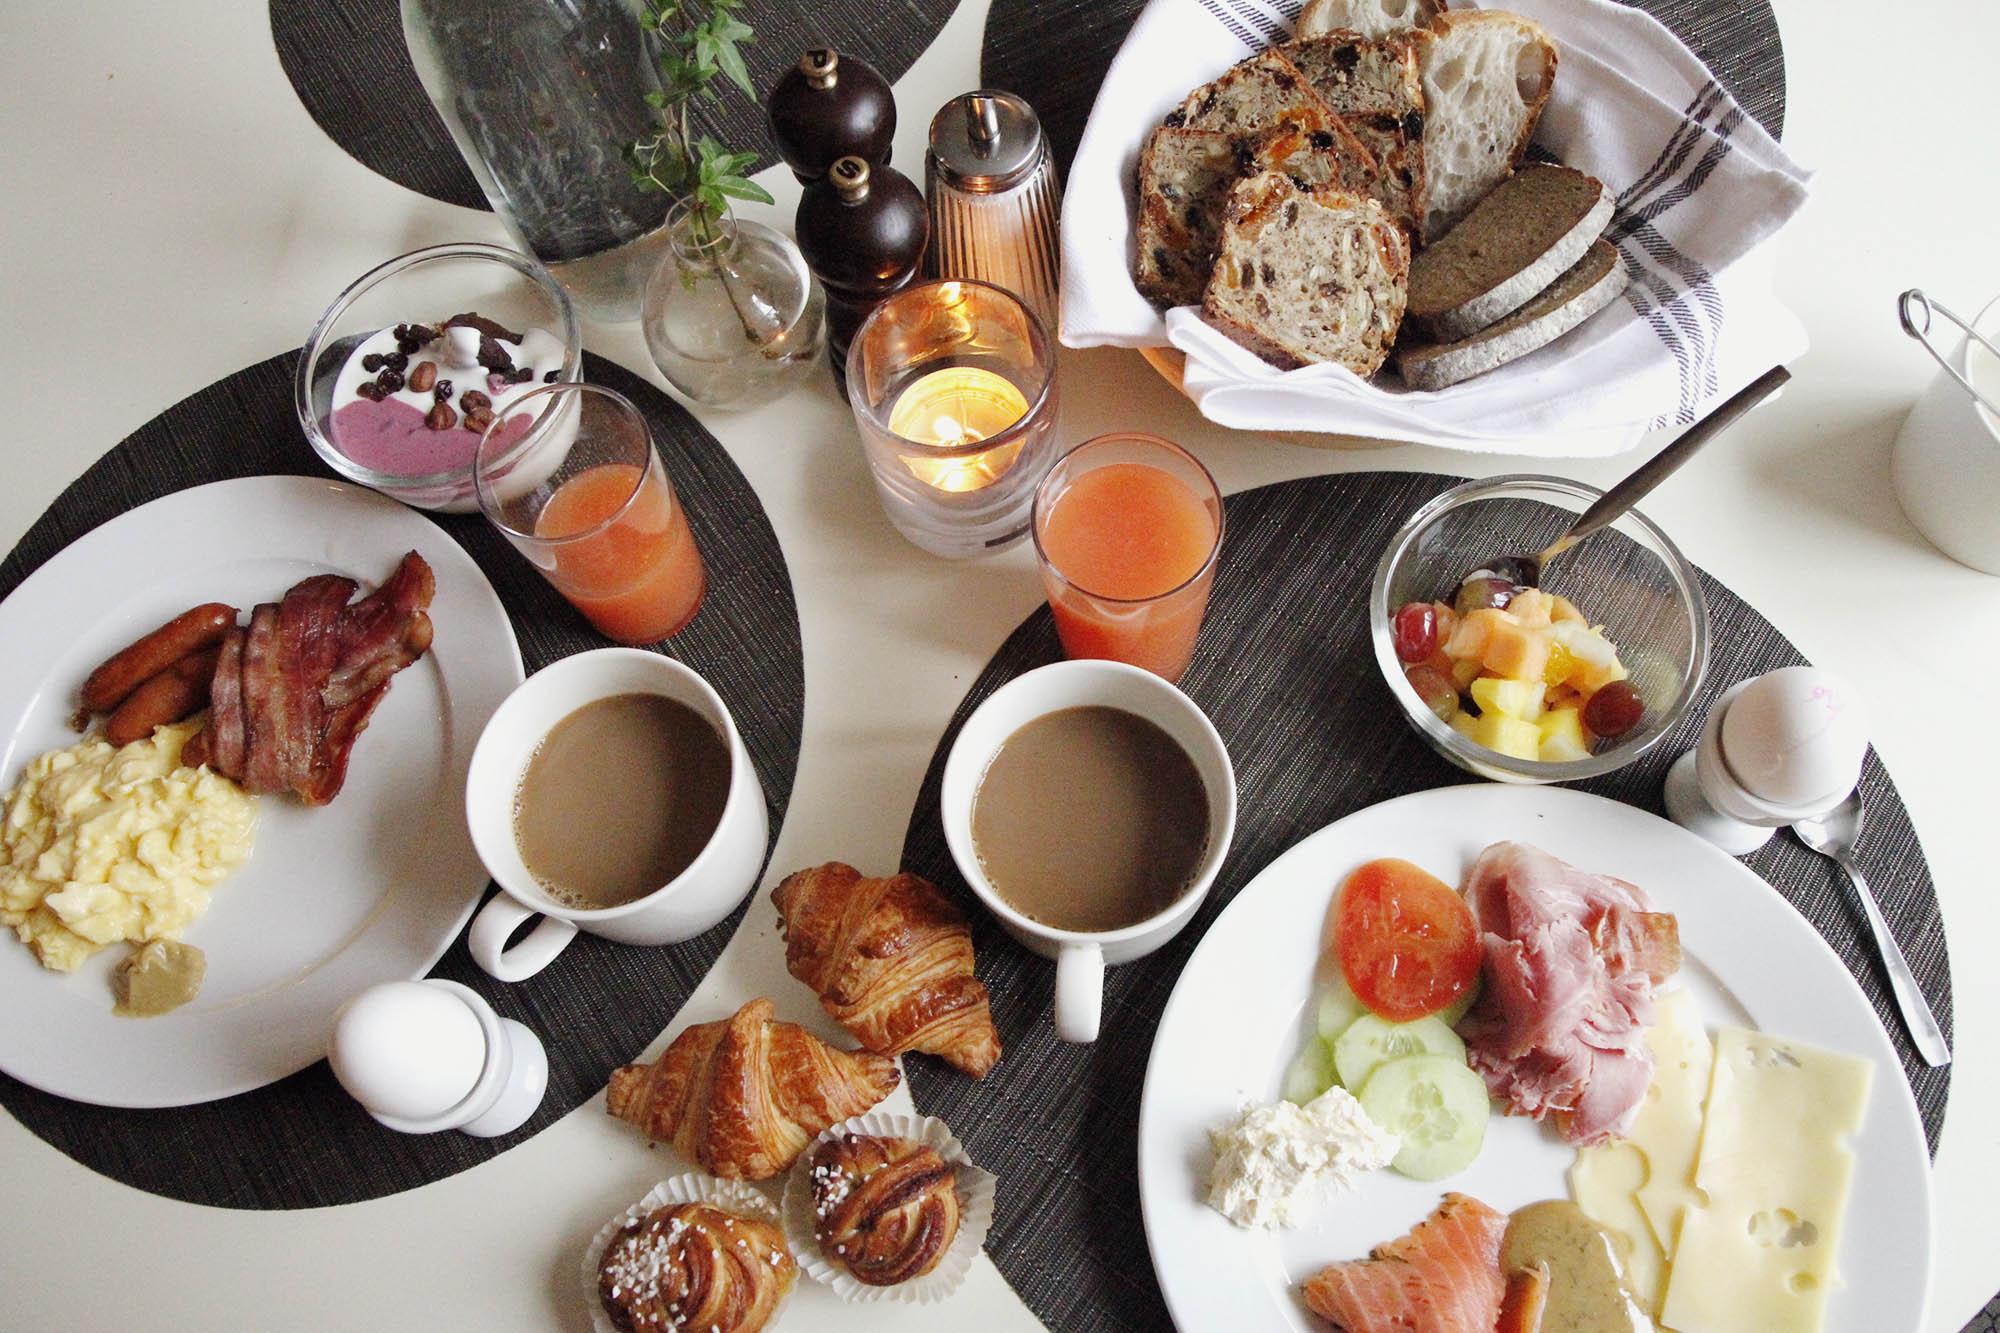 2017-04-Hotel-Skeppsholmen - hotel-skeppsholmen-stockholm-nectarandpulse-breakfast-7.jpg